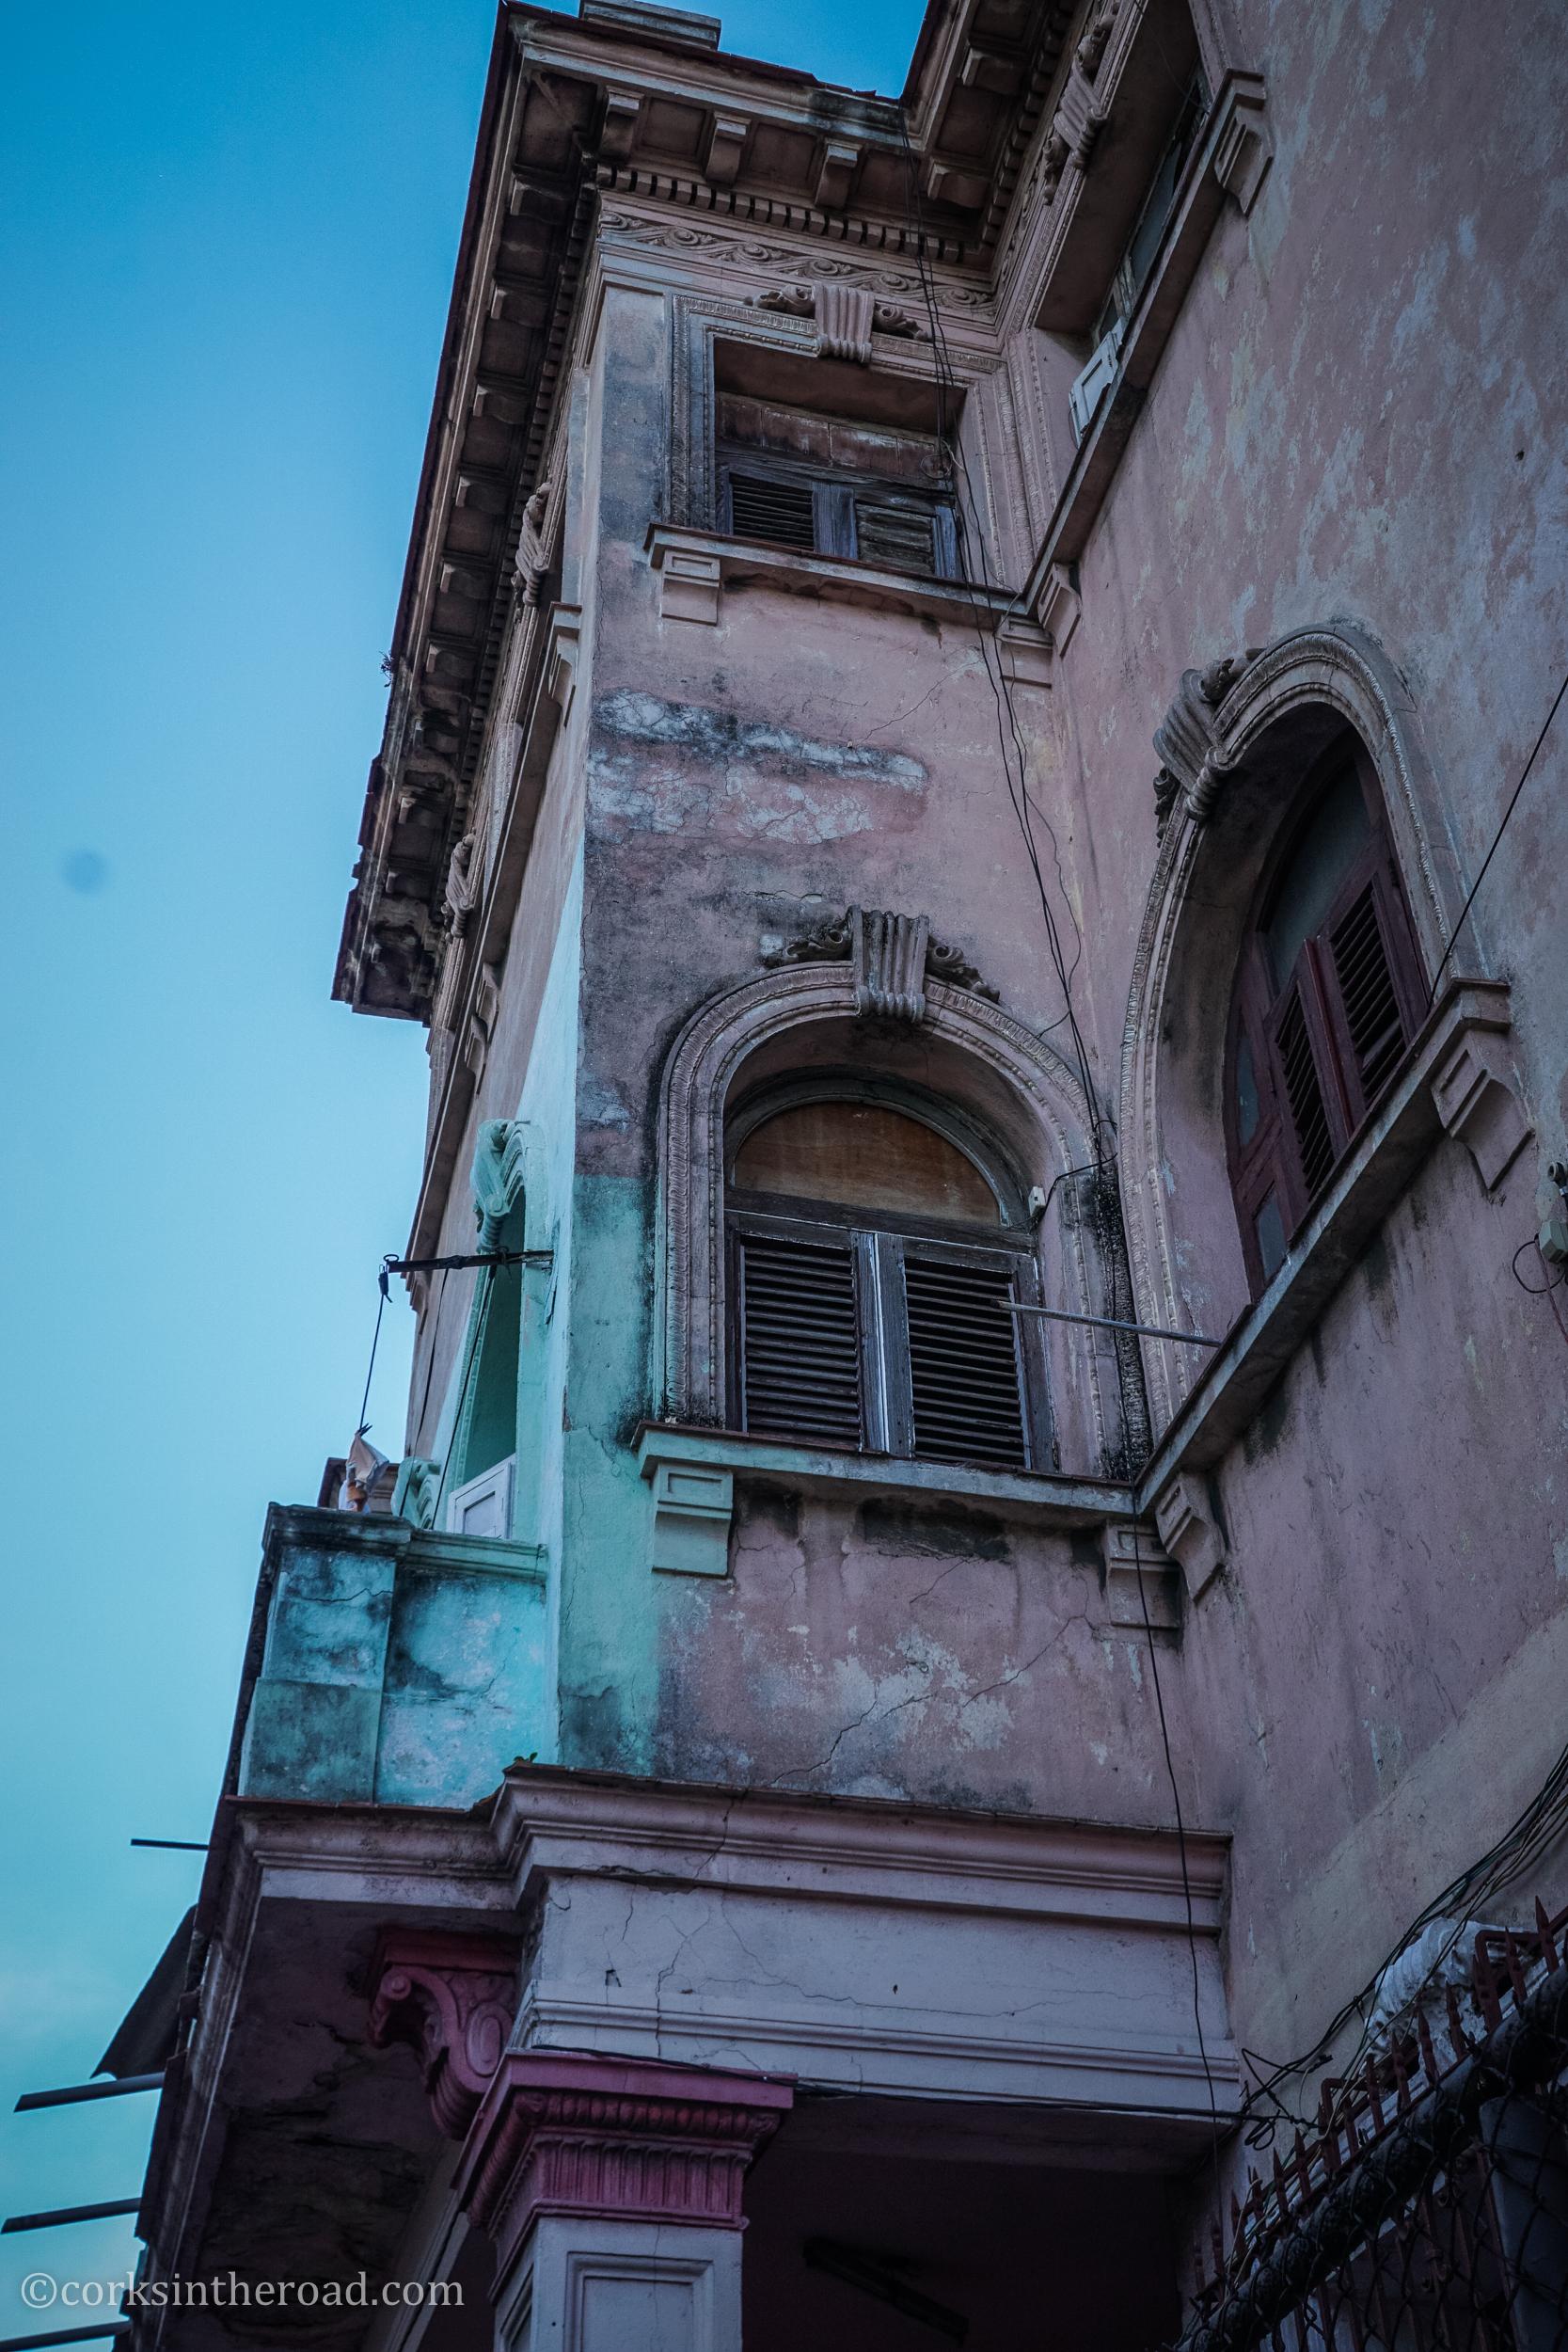 Architecture, Corksintheroad, Cuba, Havana-16.jpg